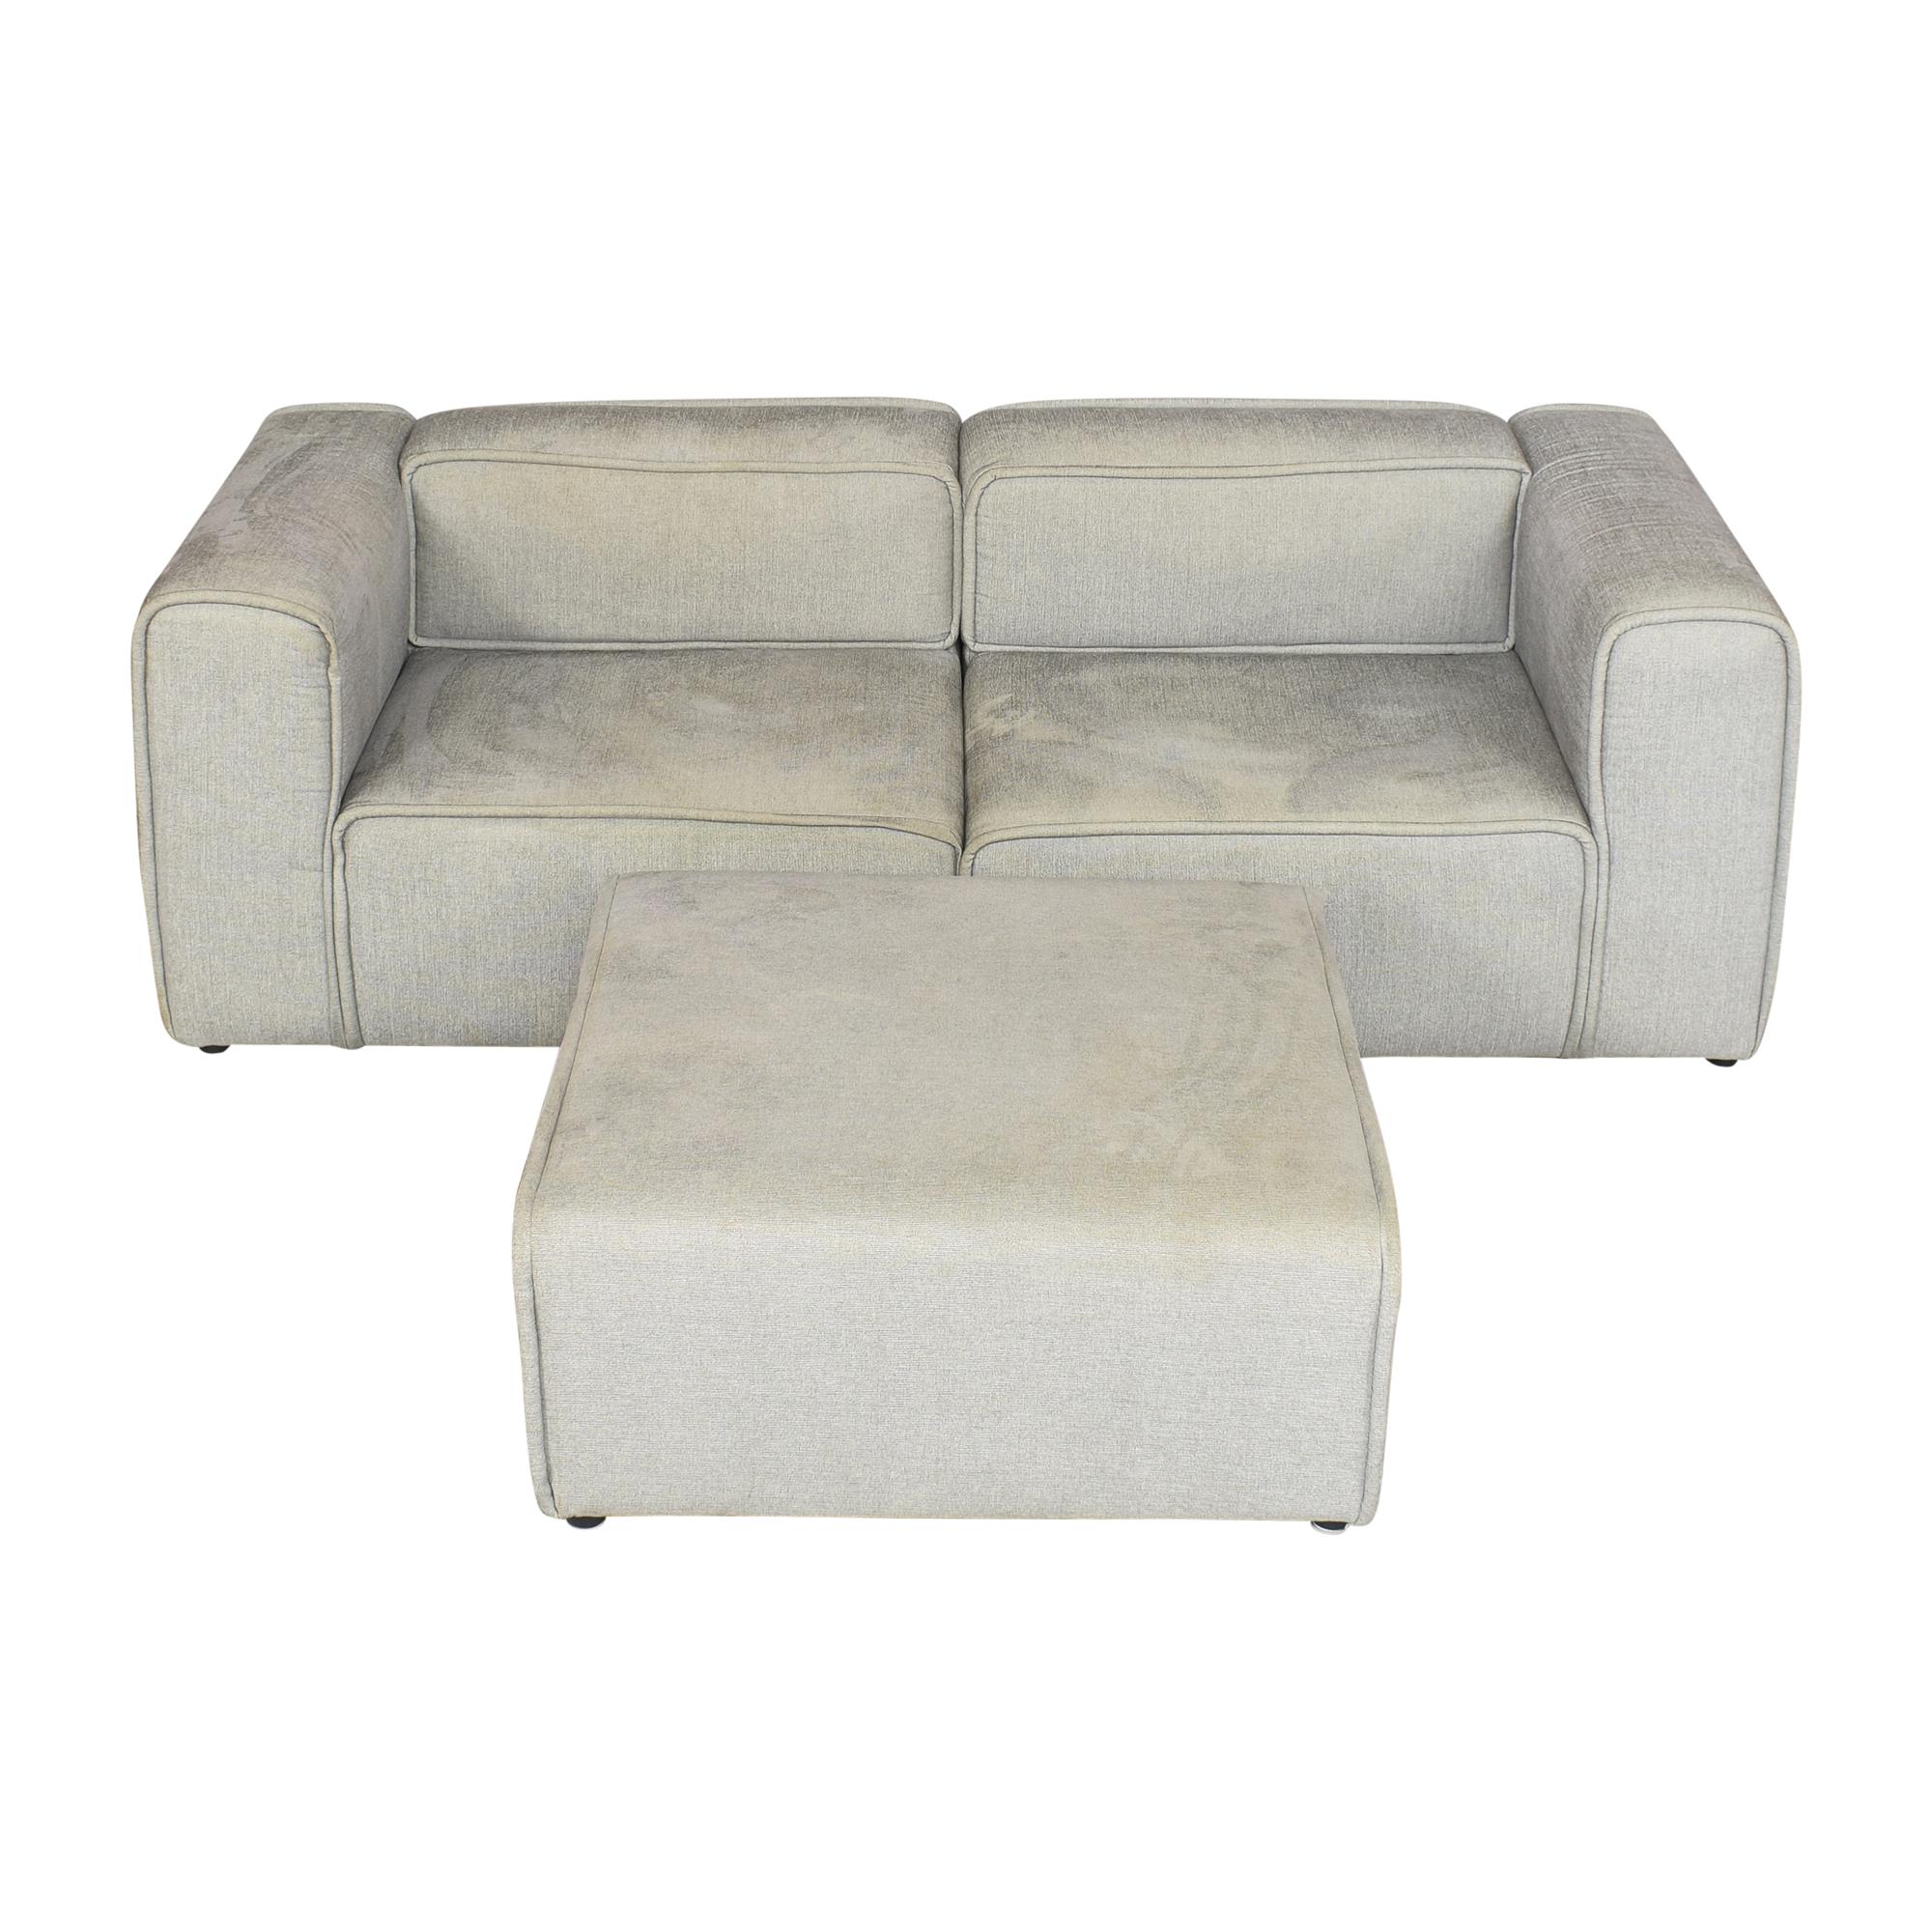 BoConcept BoConcept Carmo Modular Sofa and Ottoman Sofas